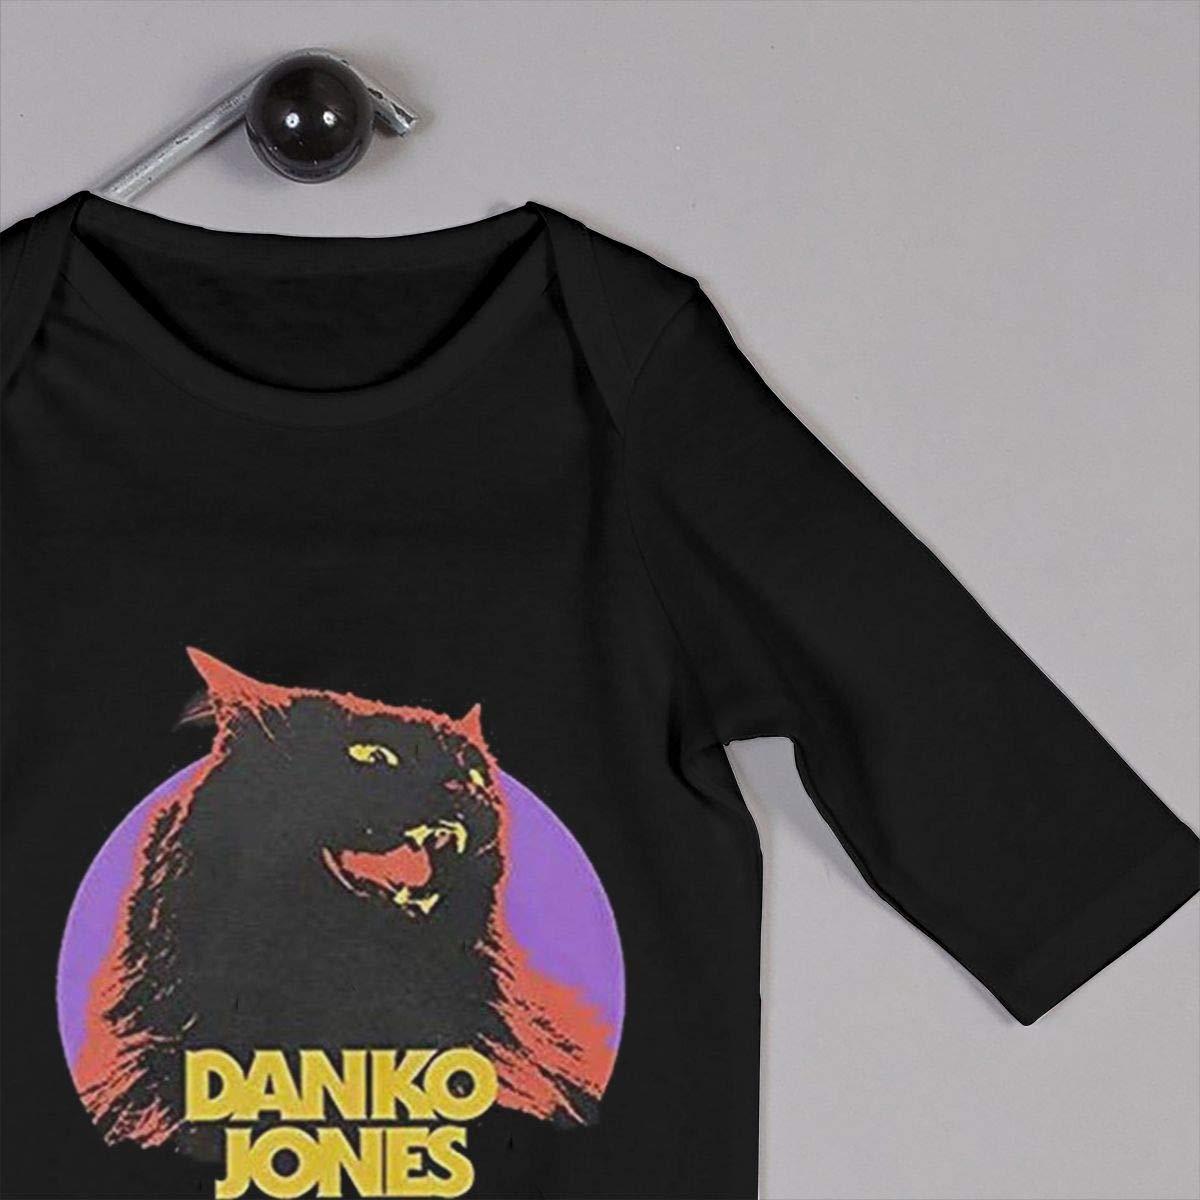 Fional Infant Long Sleeve Romper Danko-Jones-Wild-Cat Newborn Babys 0-24M Organic Cotton Jumpsuit Outfit